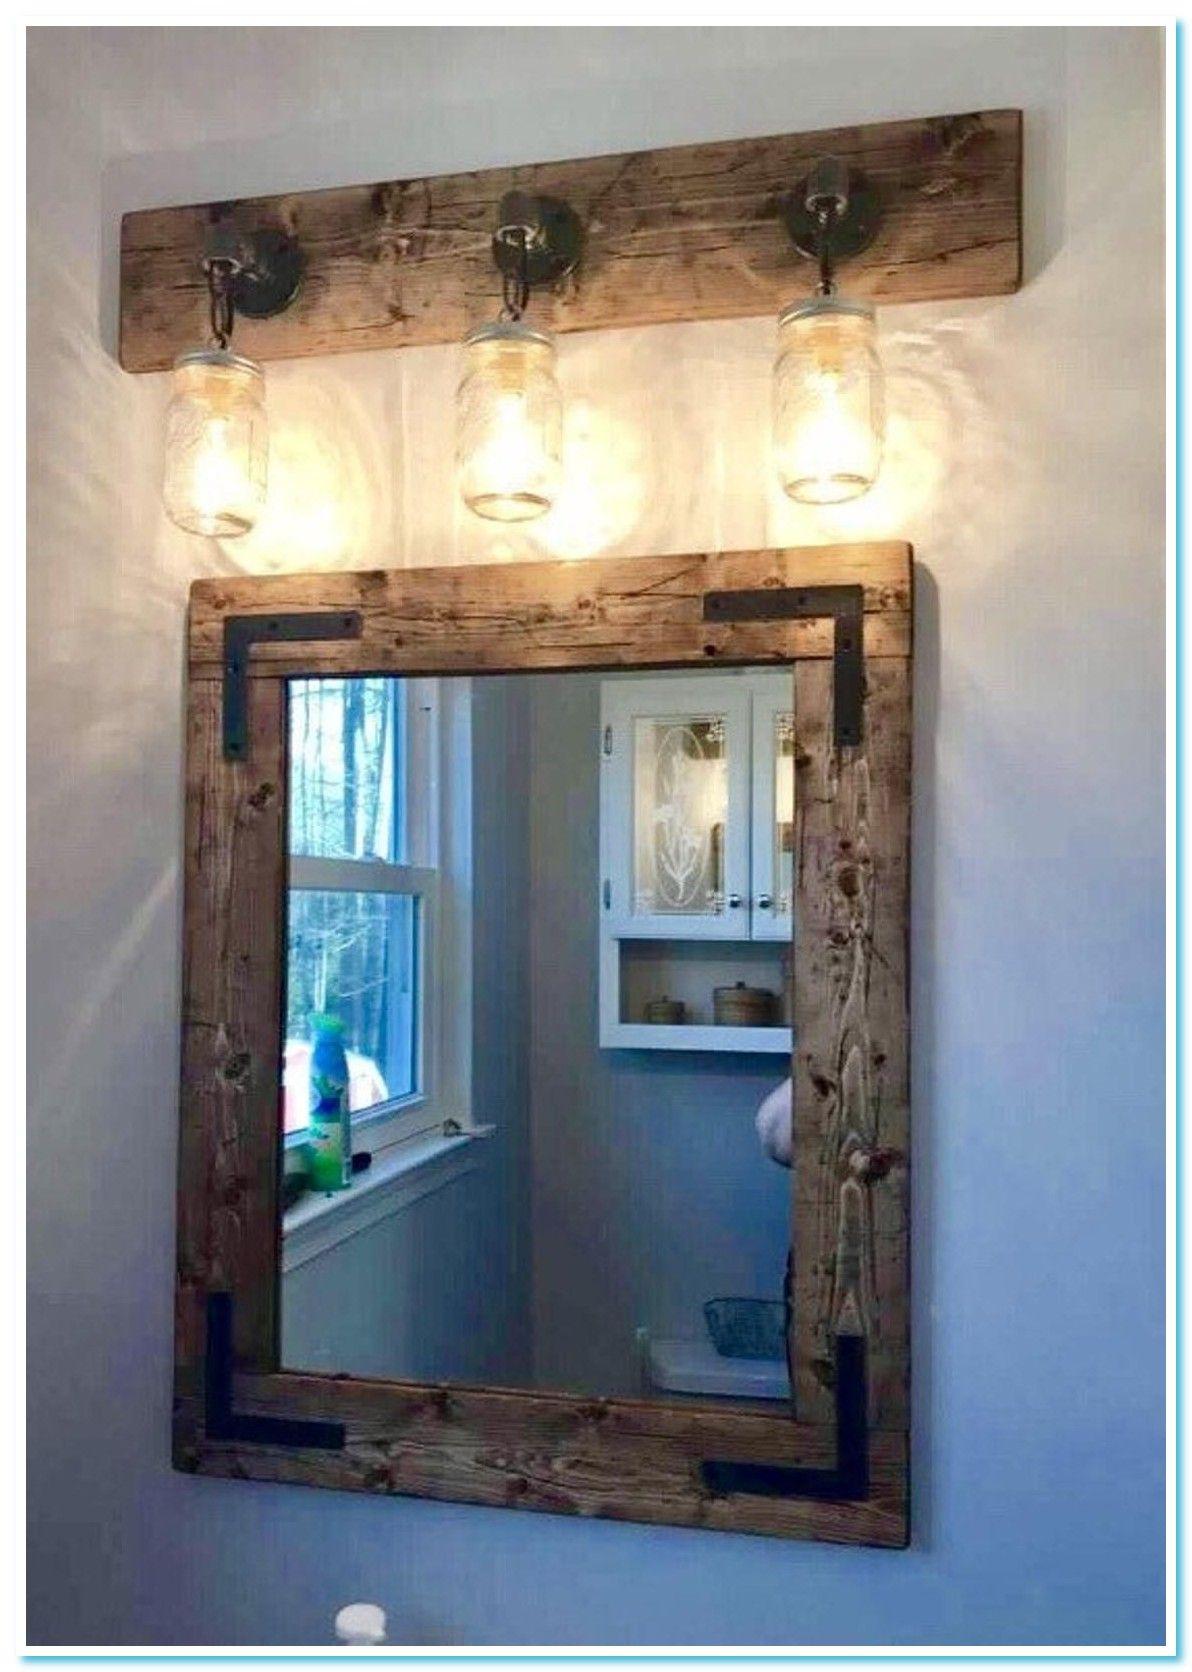 108 Reference Of Vanity Diy Lights Farmhouse Mirrors Rustic Mirrors Rustic Bathroom Decor